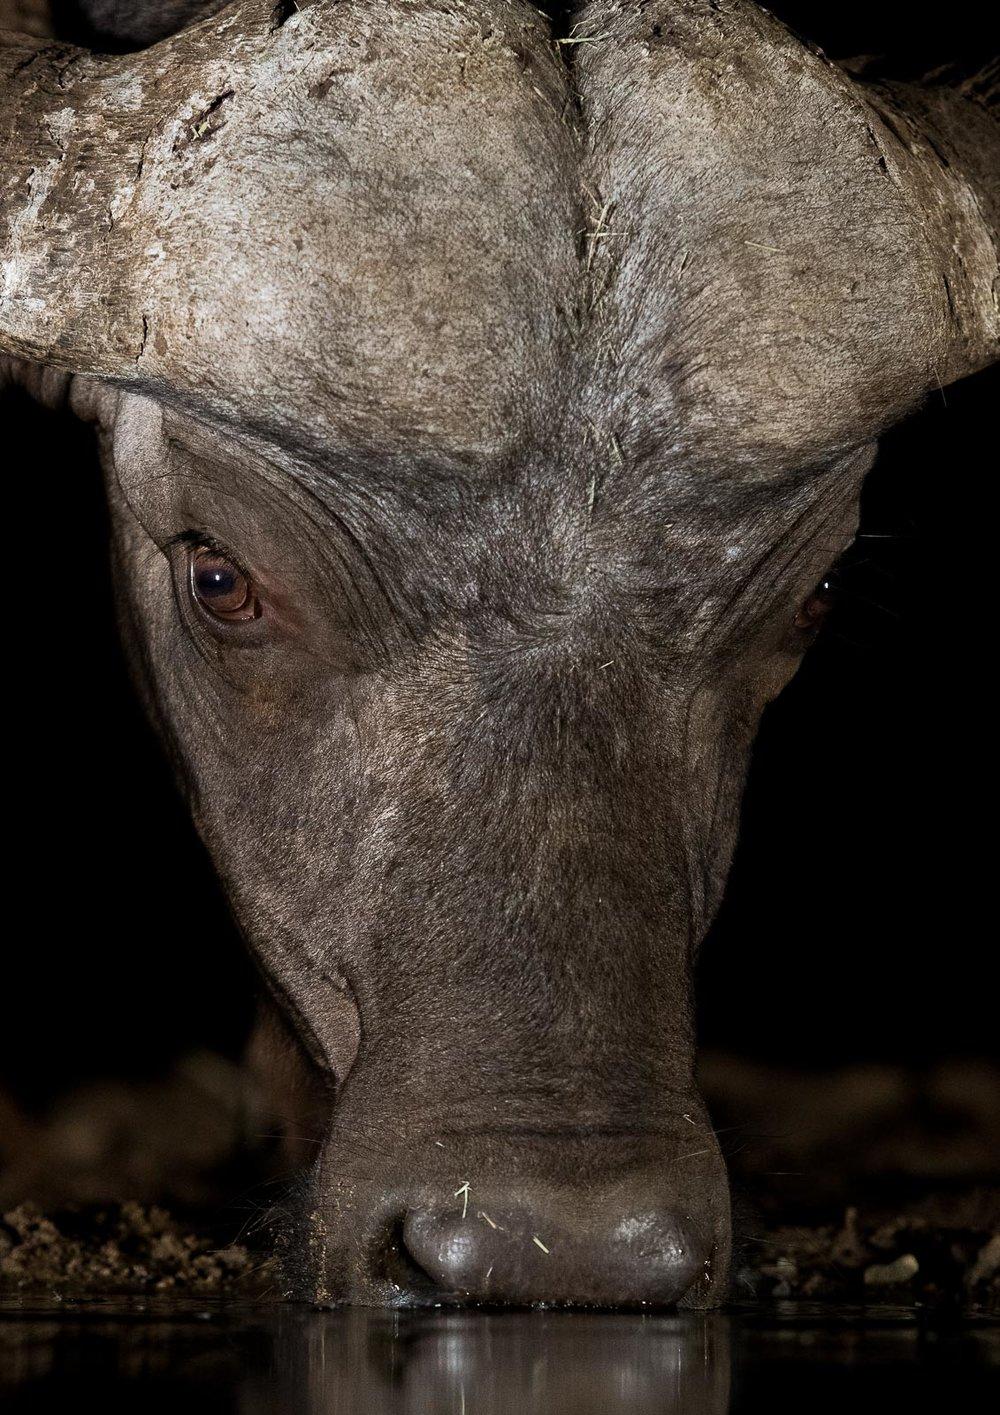 UMGODI: Cape Buffalo  Nikon D500 70-200mm f2.8 at 165mm. 1/160, f3.5, ISO3200